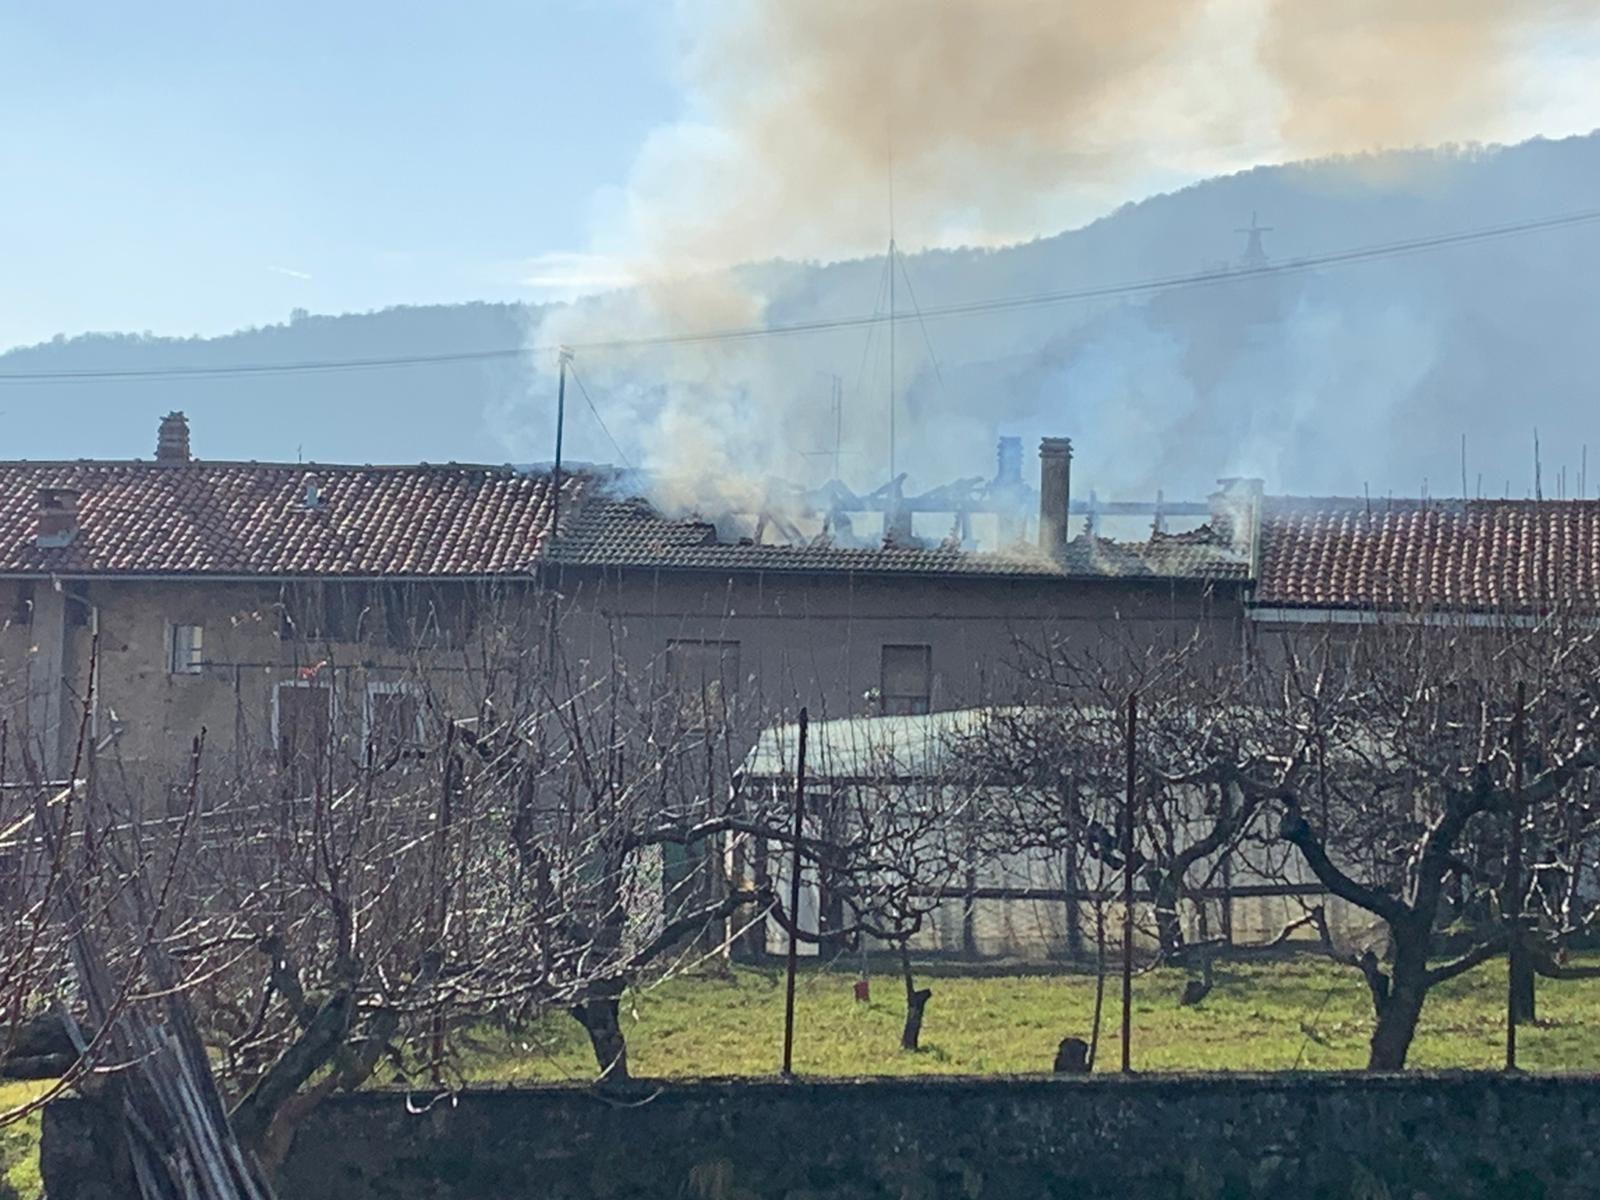 FORNO - Incendio devasta una casa in via Carlo Alberto - FOTO